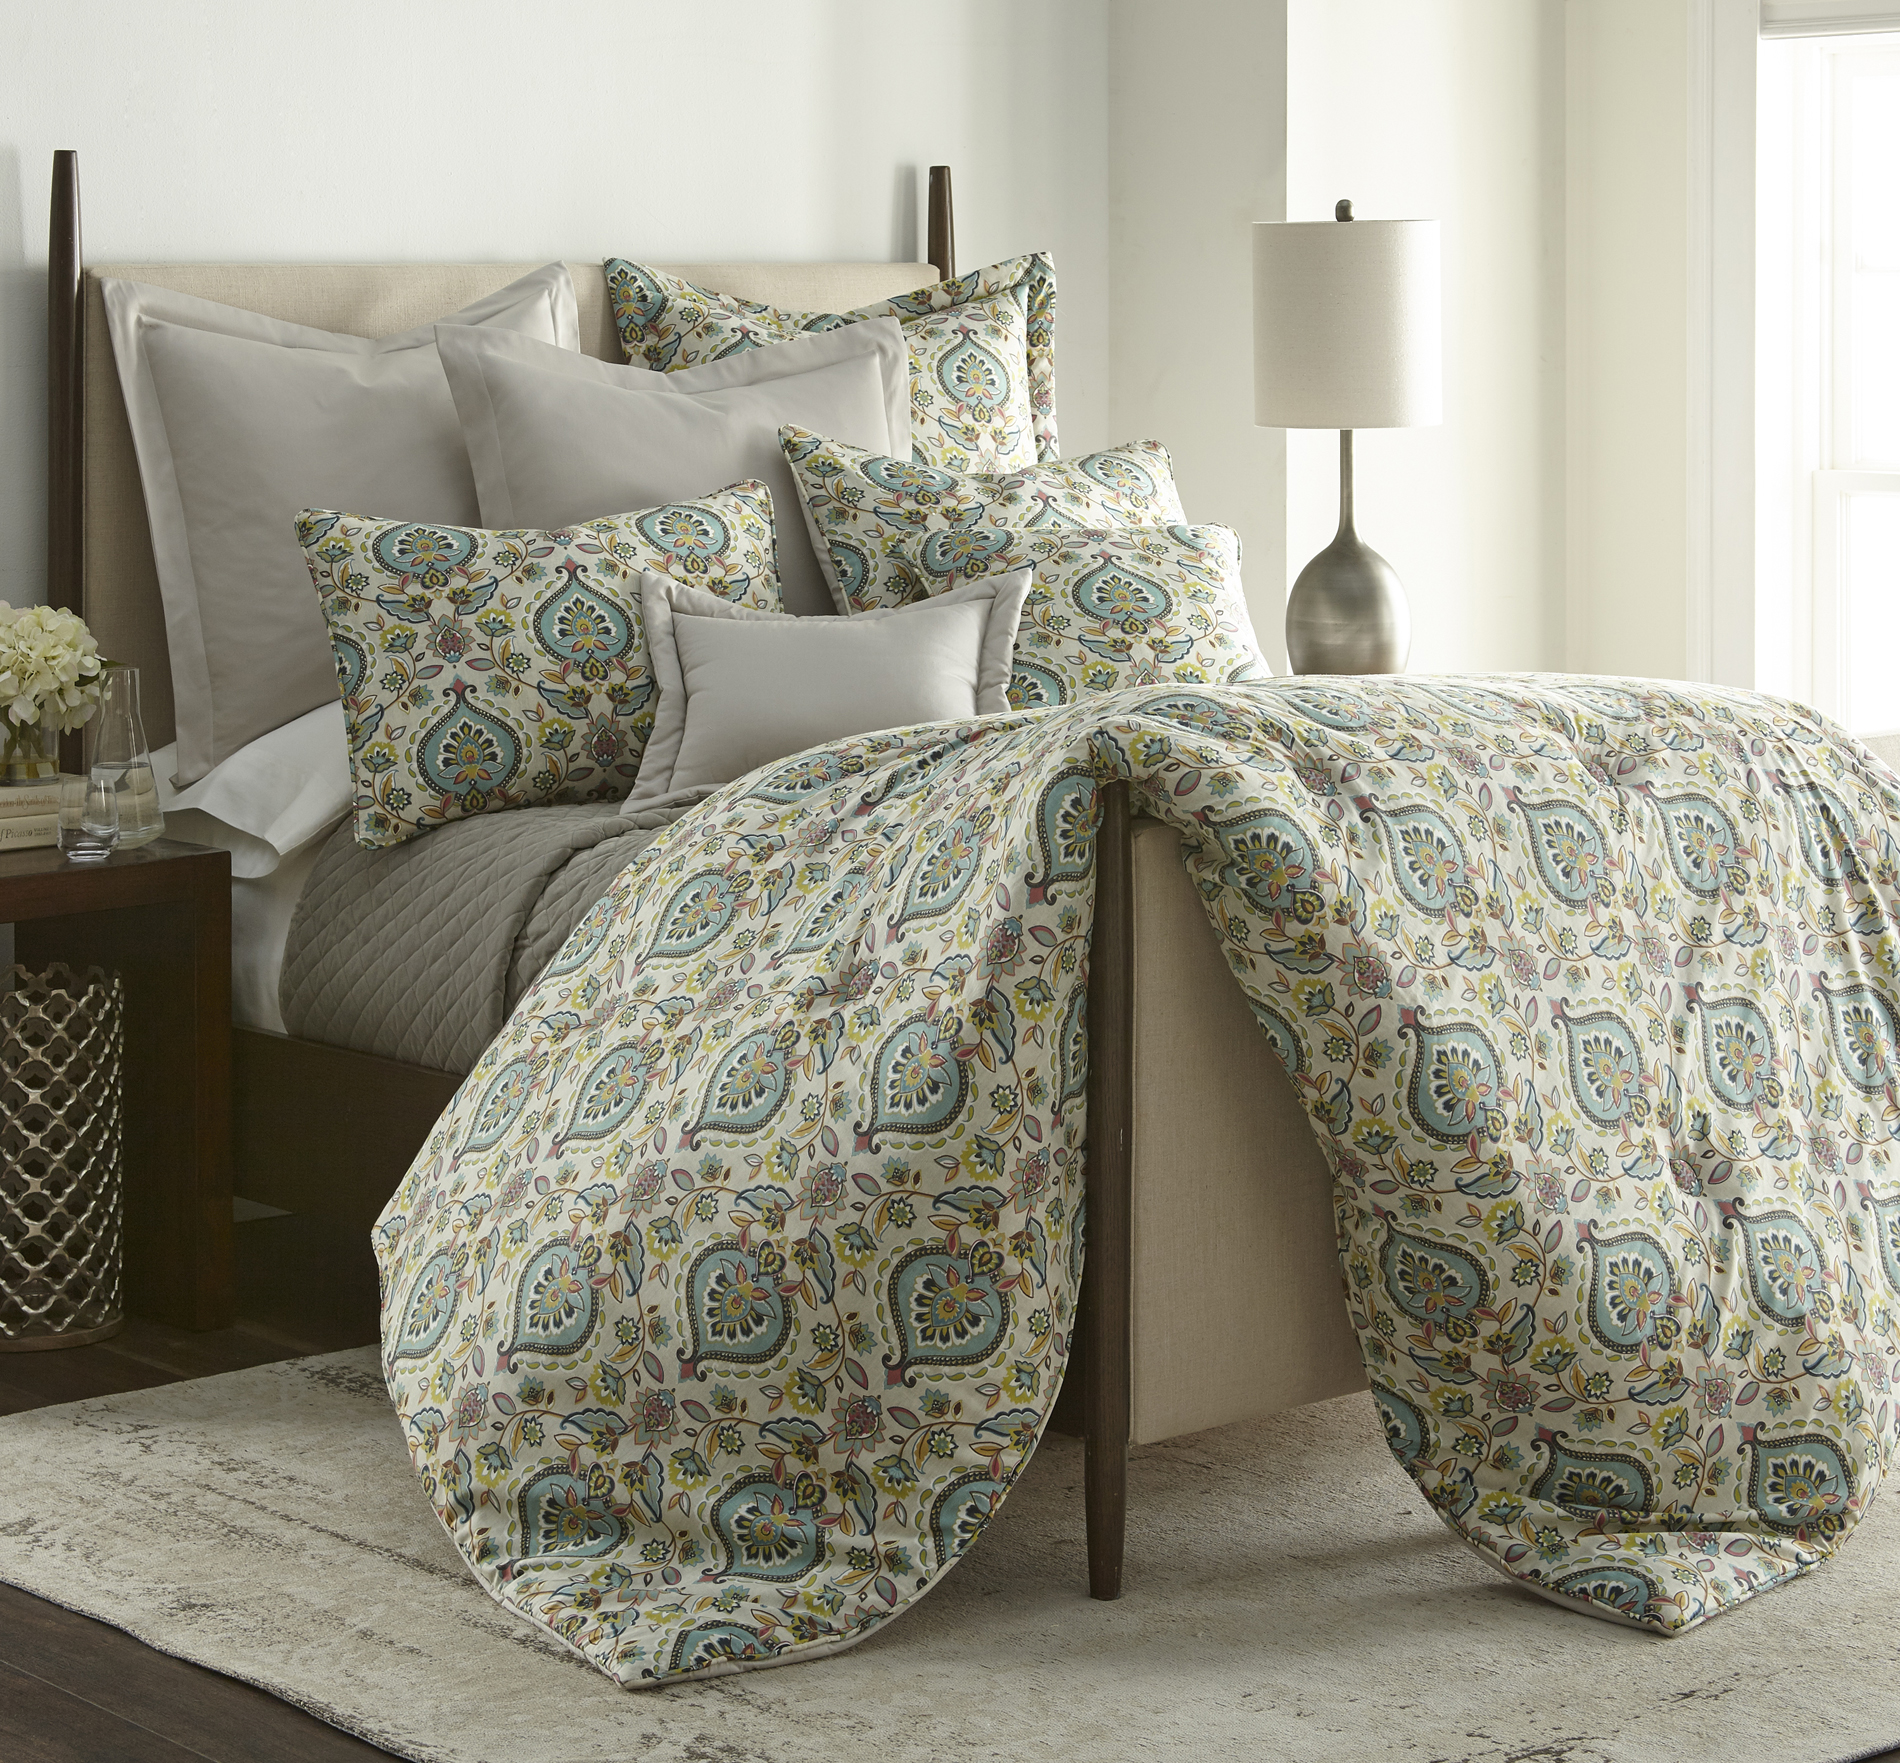 Sherry Kline Splendor Icewater 3-piece Comforter Set